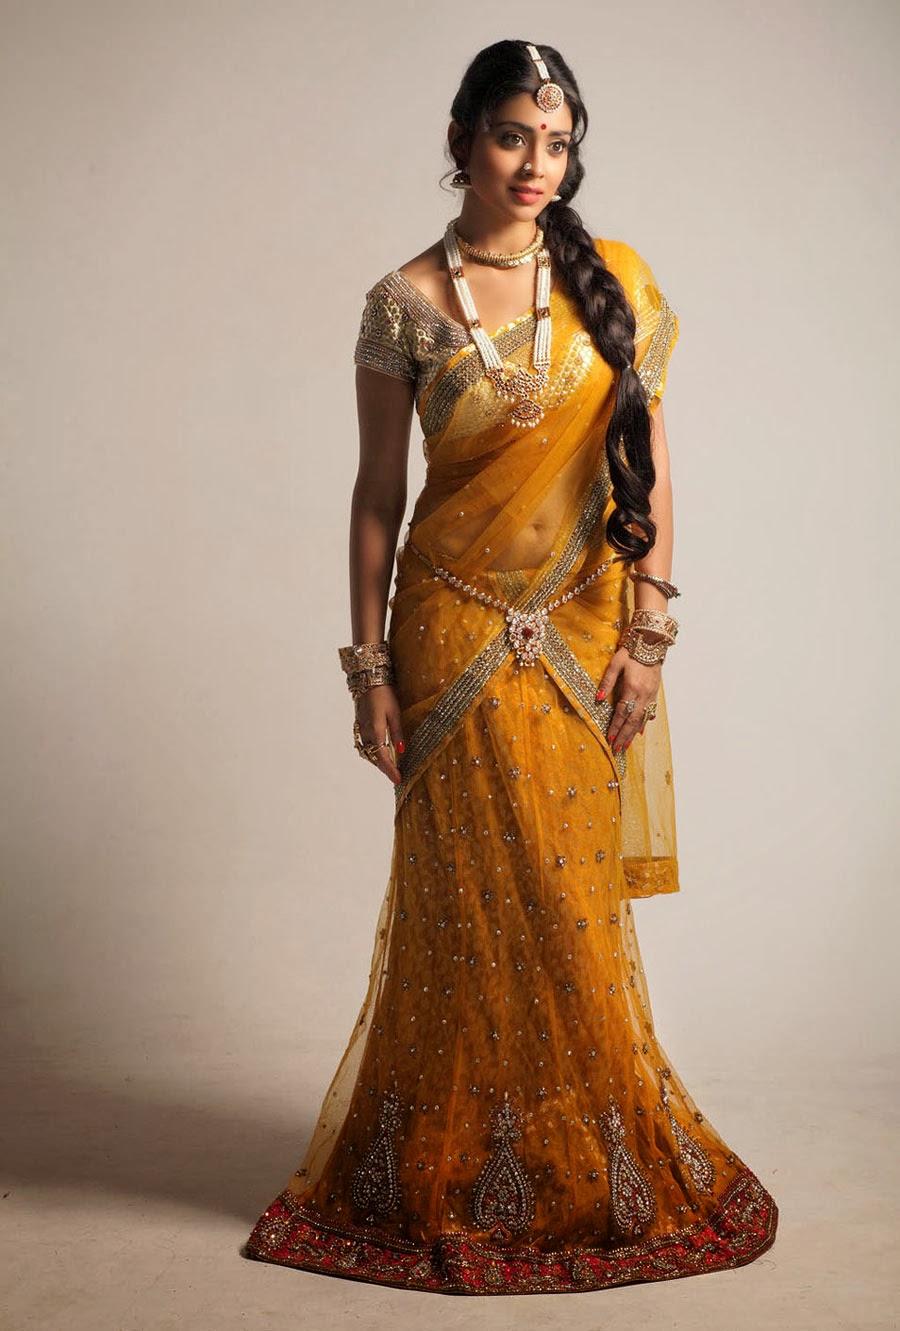 Shriya Saran In Beautiful Saree HD Wallpaper Free